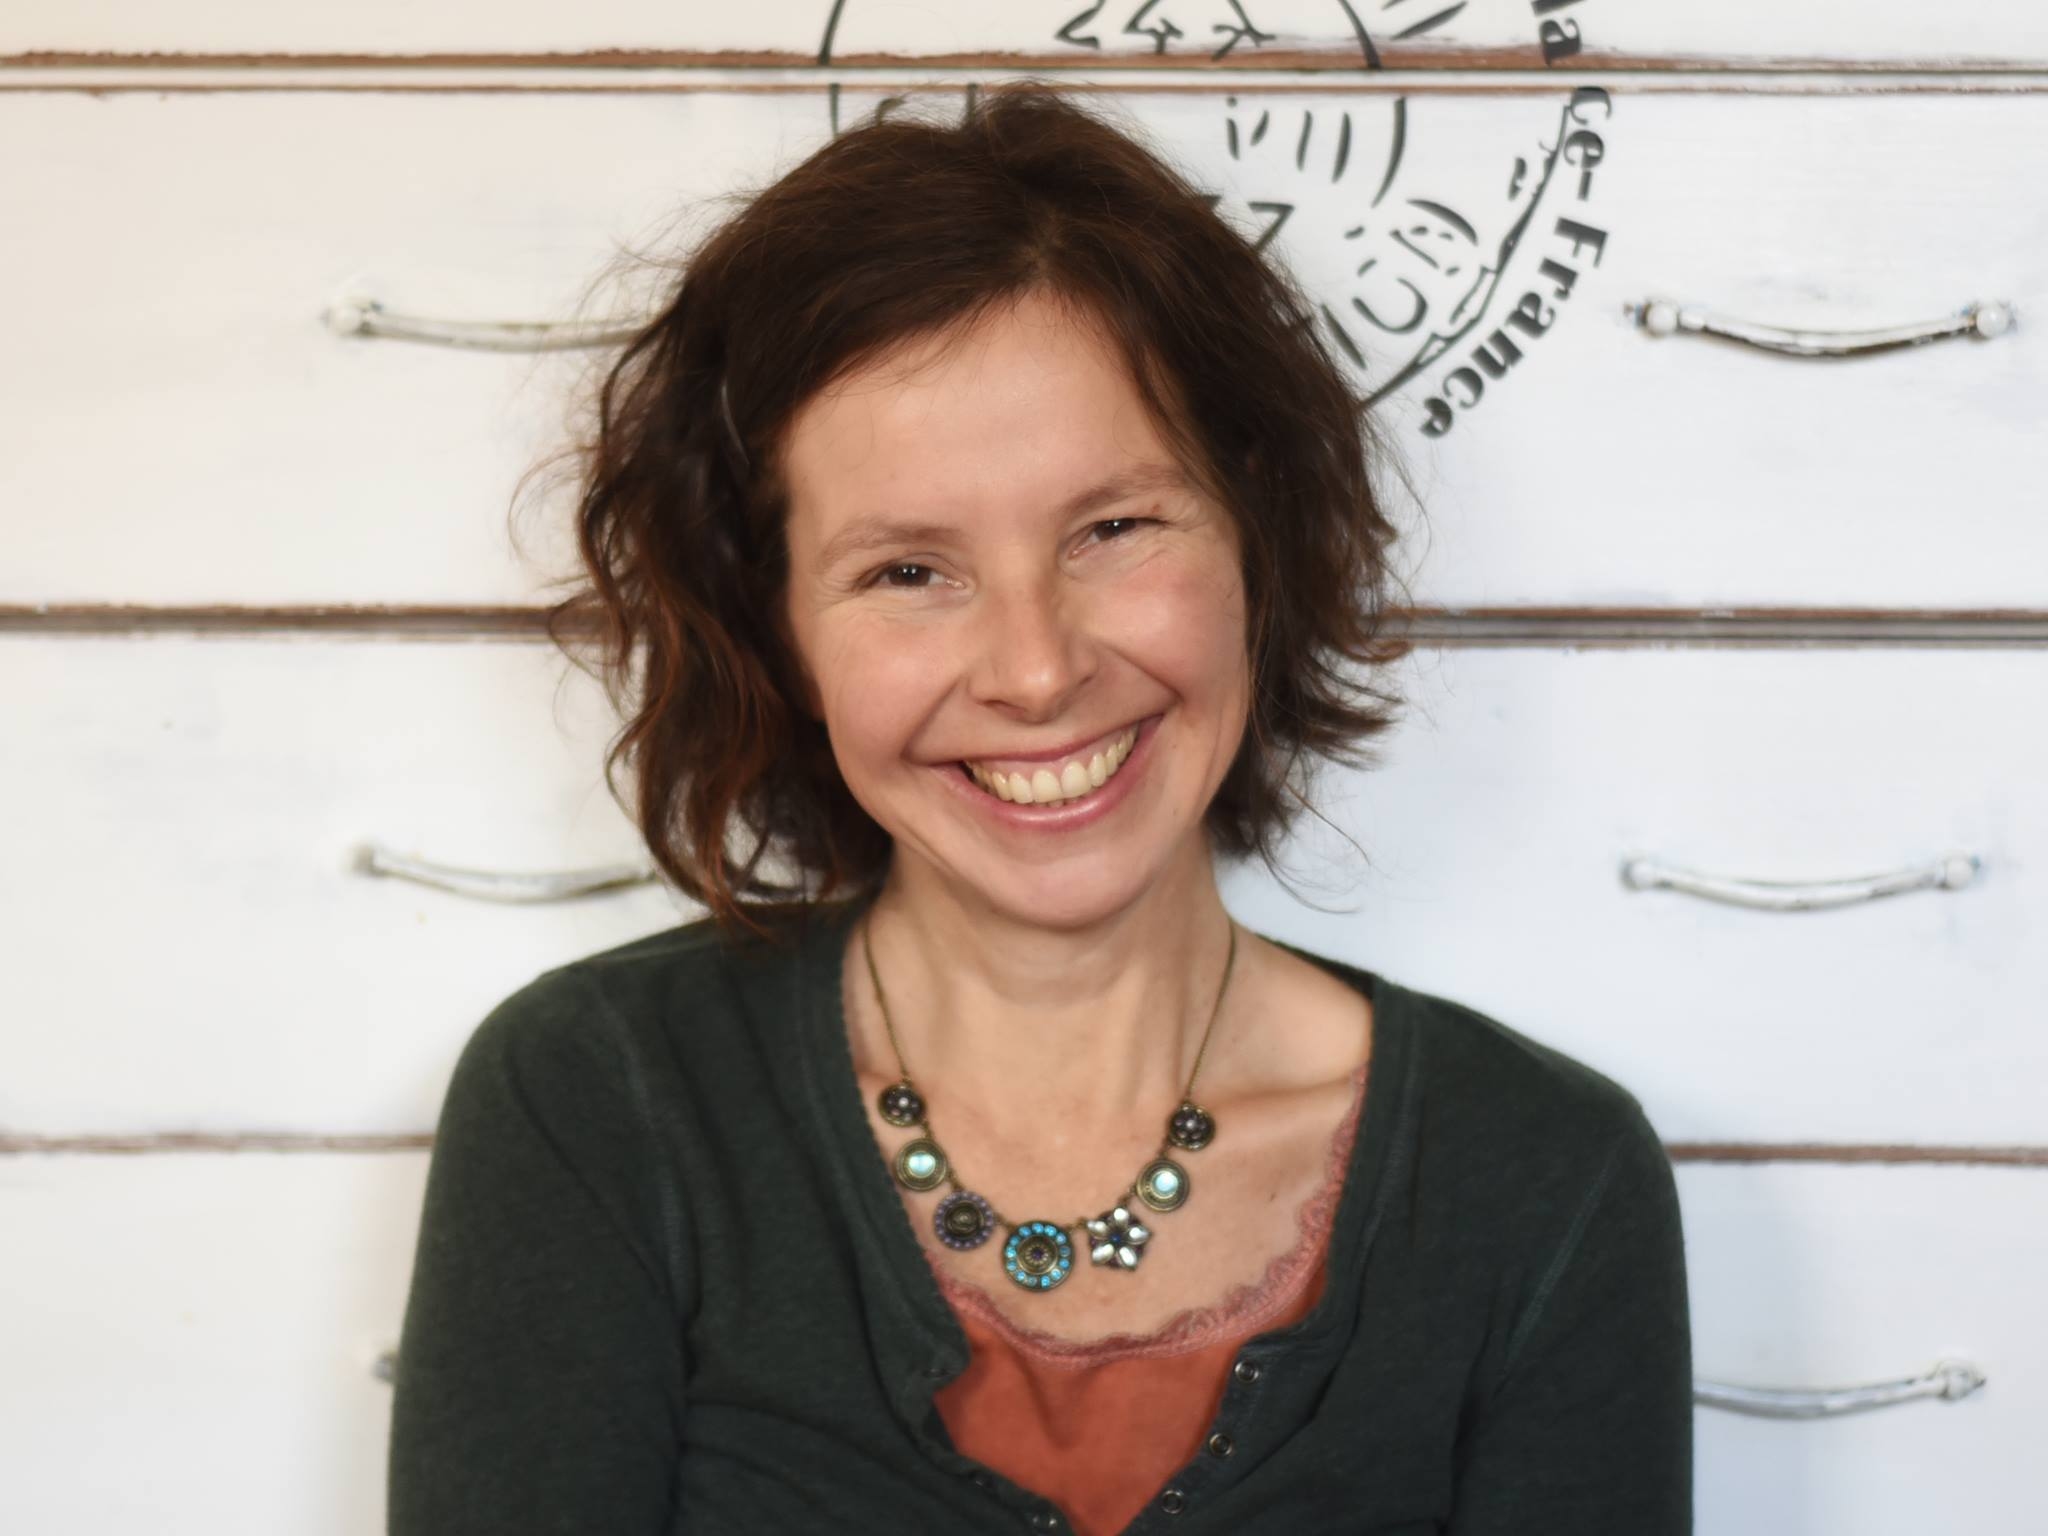 Katja Friedrich froh leben Leben in Balance